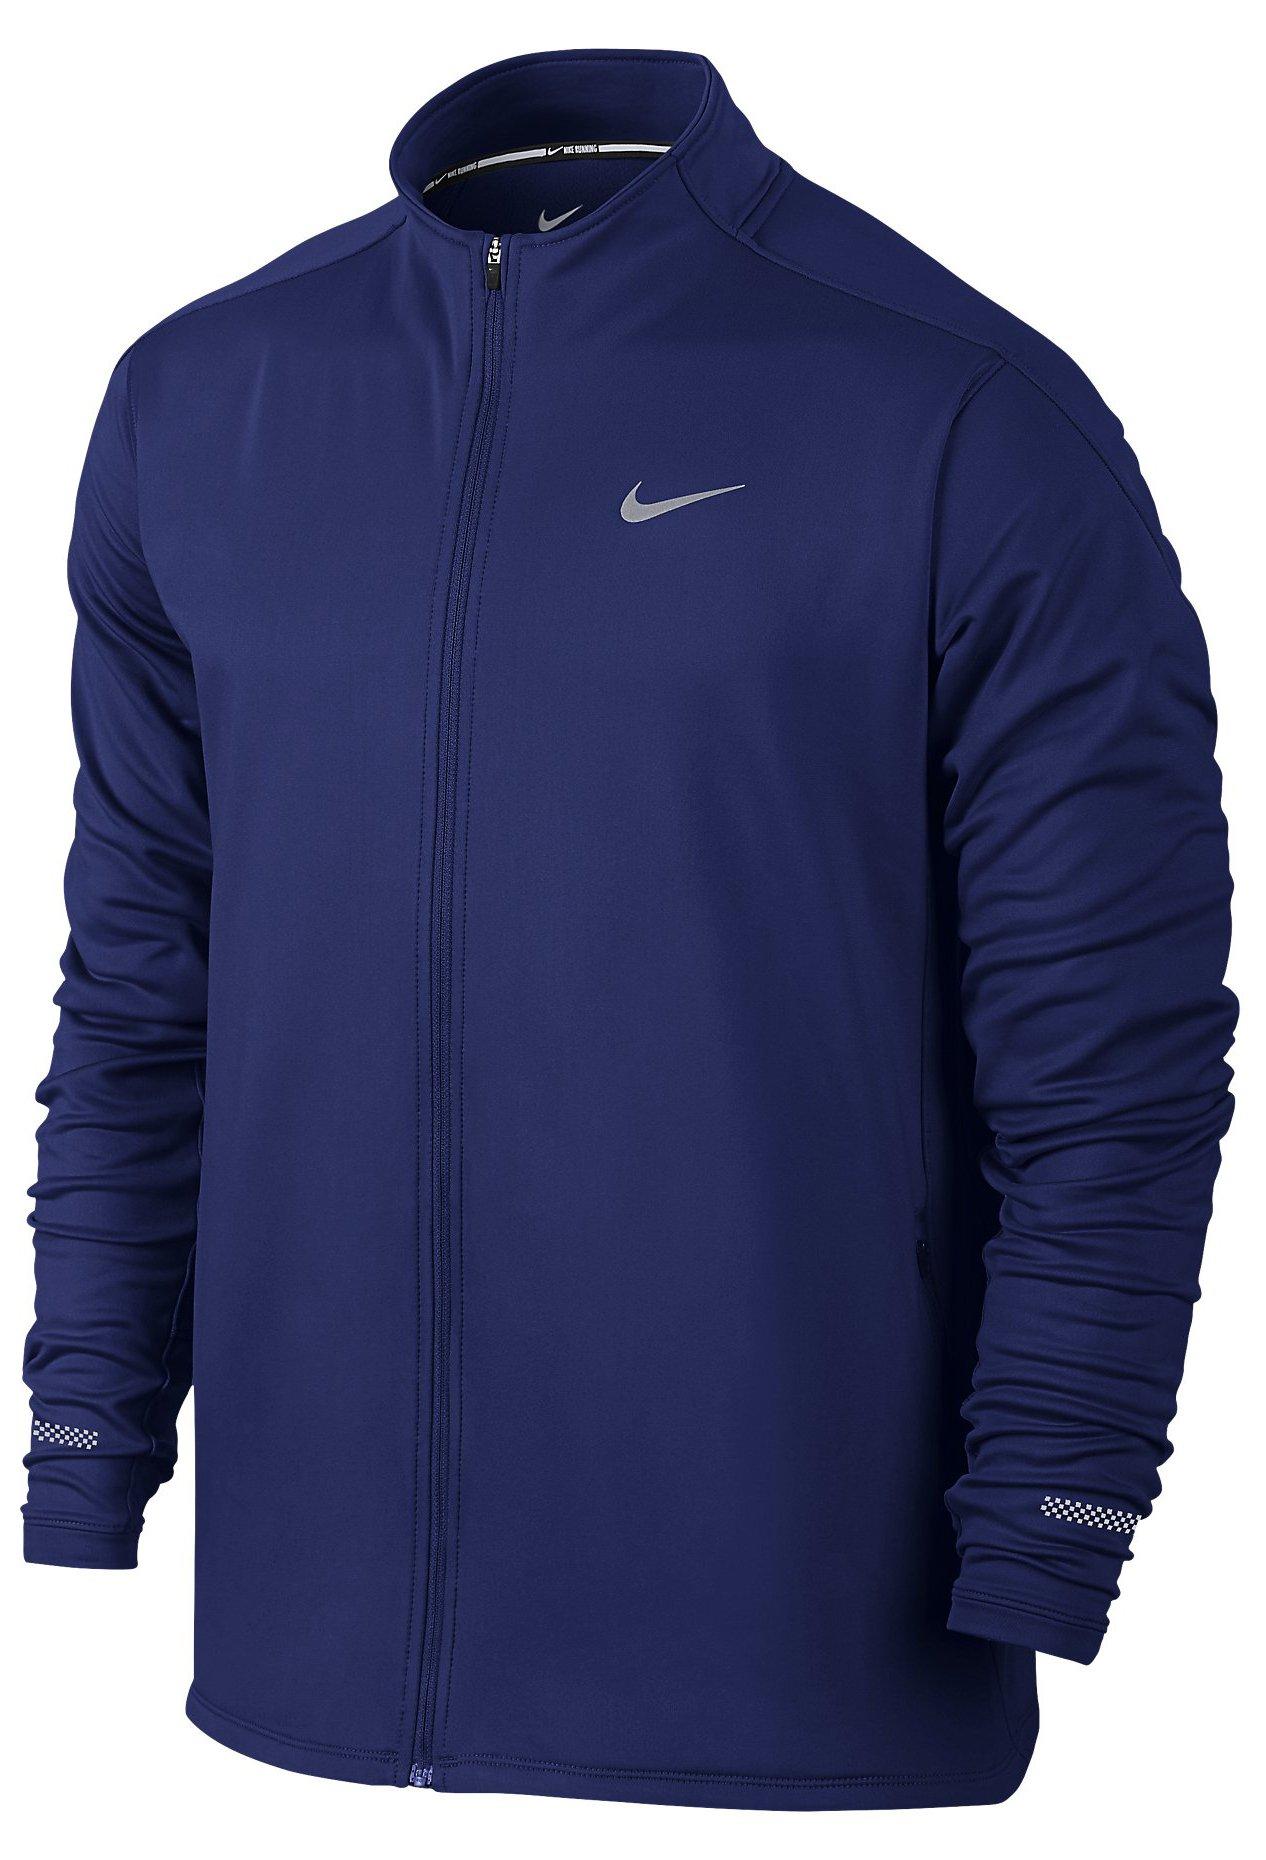 Běžecká bunda Nike Dri-FIT Thermal